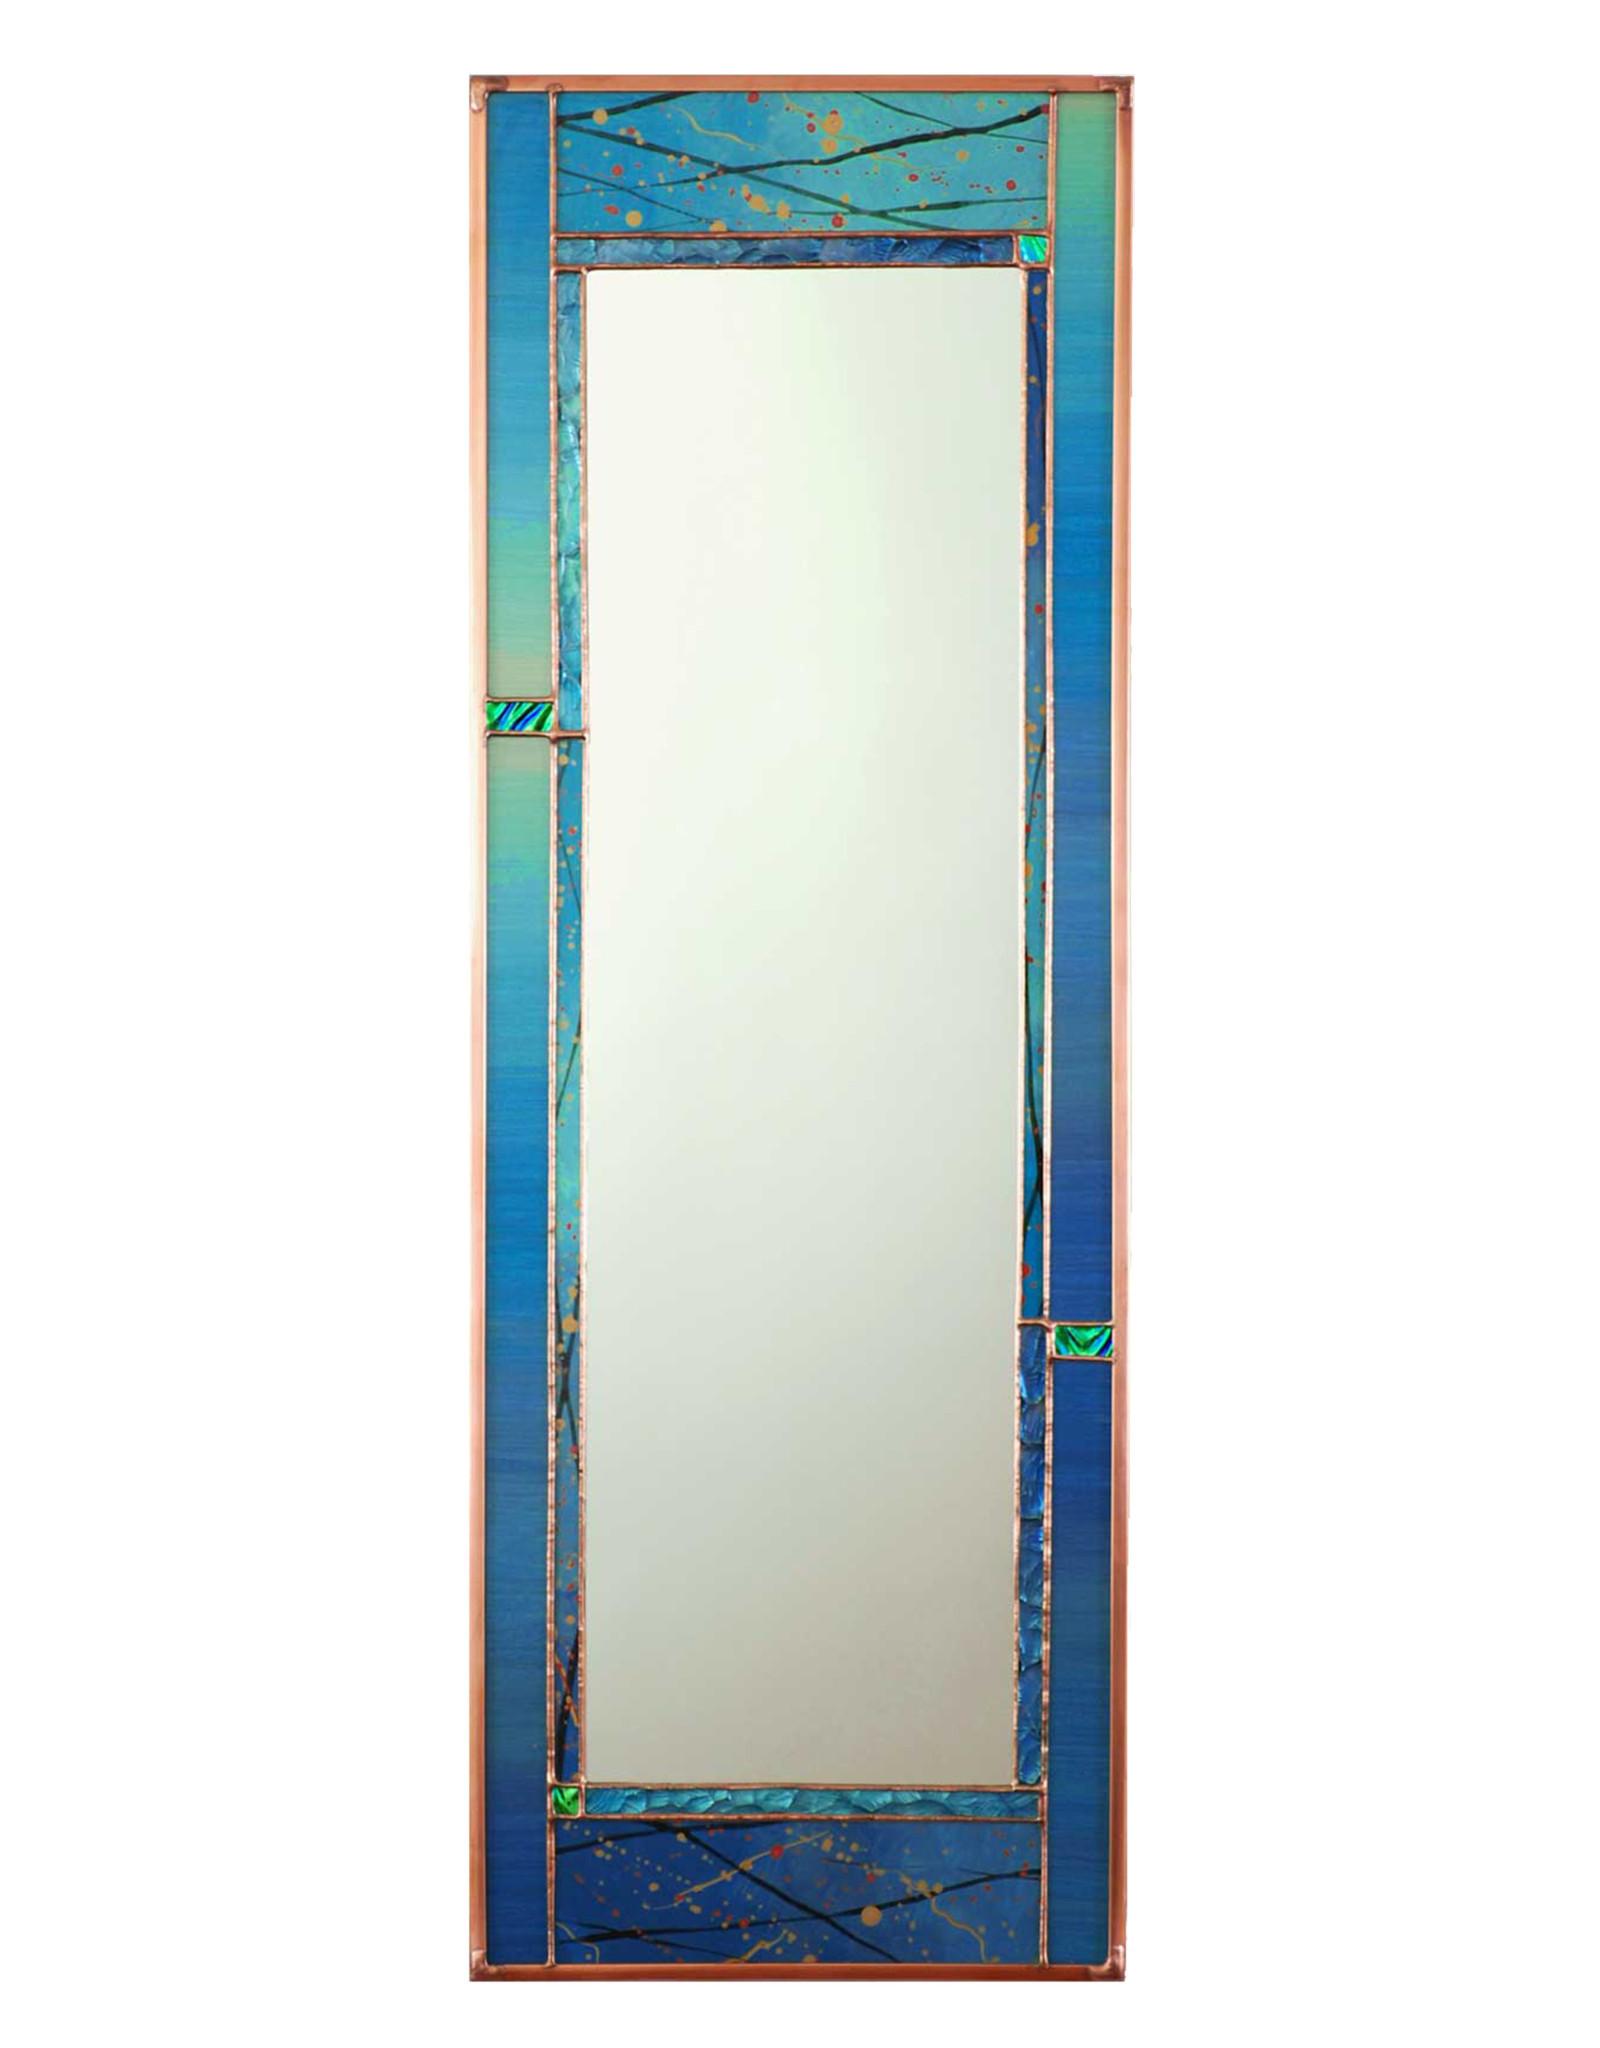 LIGHT IMAGES GLASS AQUA DUSK MIRROR